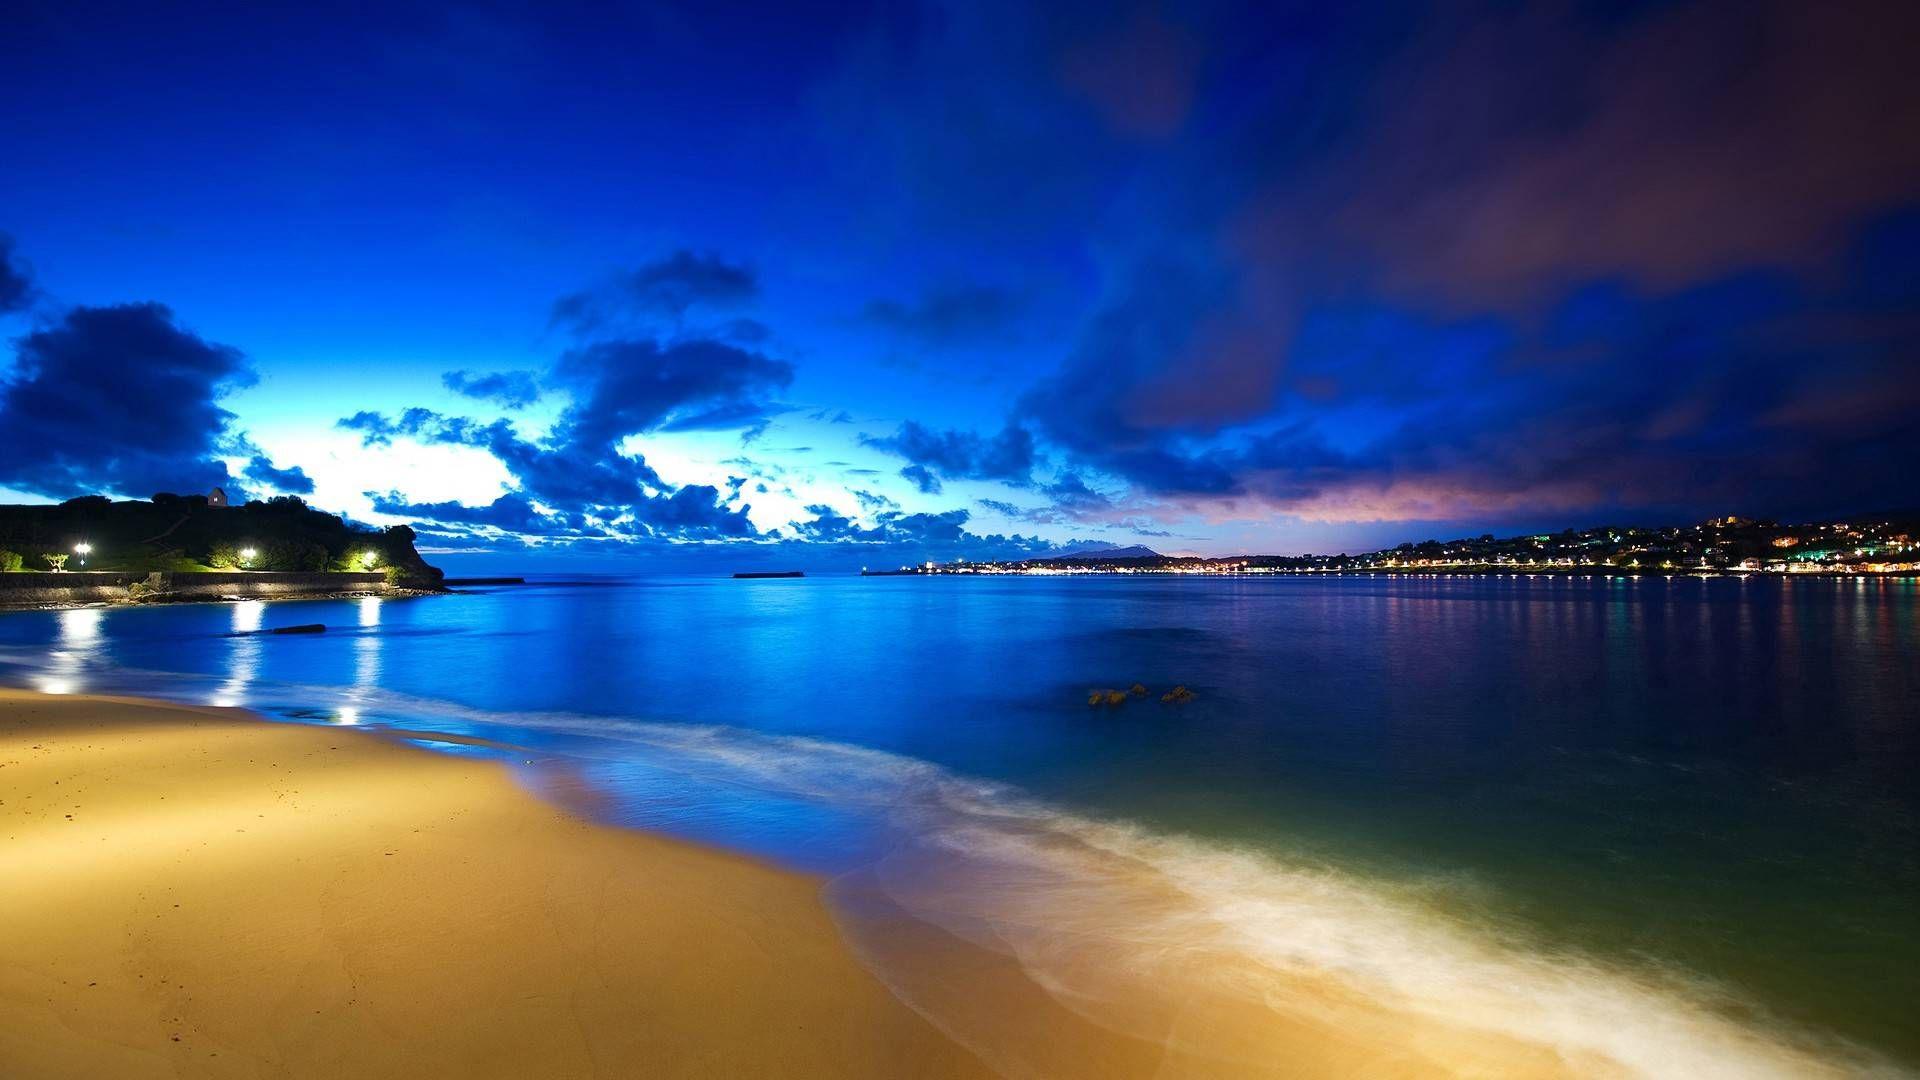 Beach Nature Scenes Nature Wallpapers 3097 Ilikewalls Com Sunset Landscape Beach Beach At Night Beach